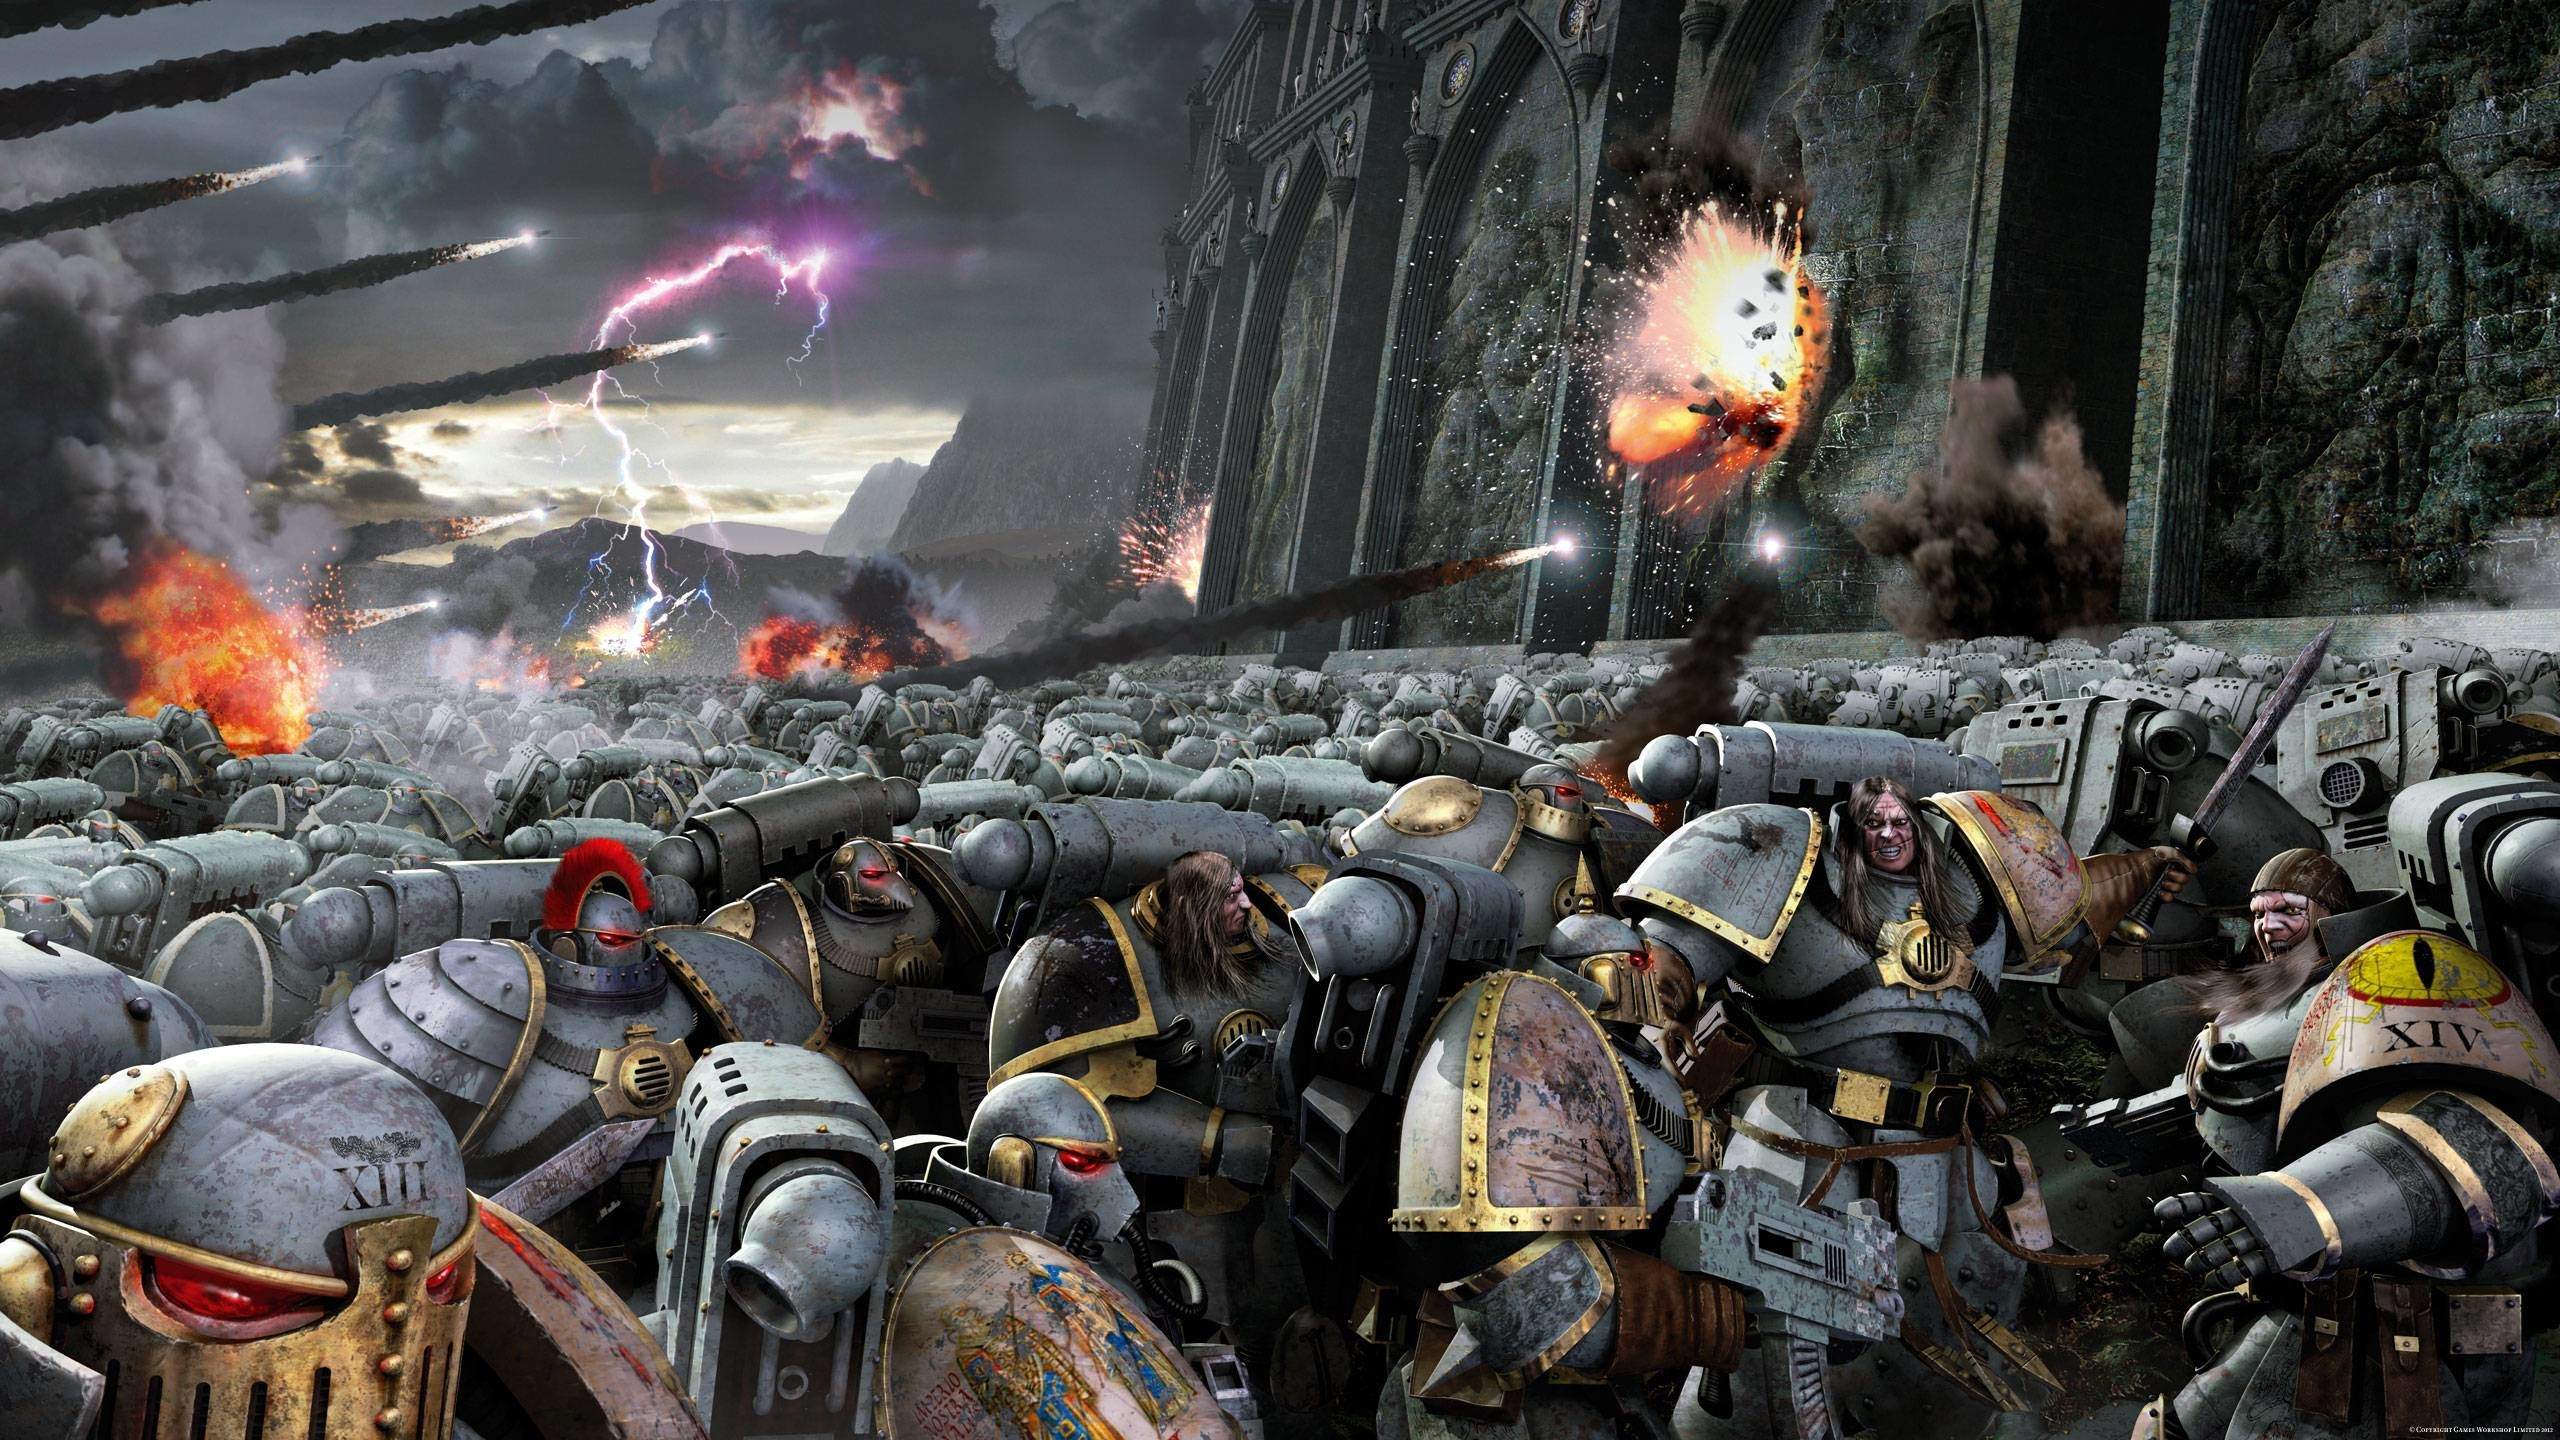 Warhammer-40K-Wallpaper-9.jpg (2560×1440)